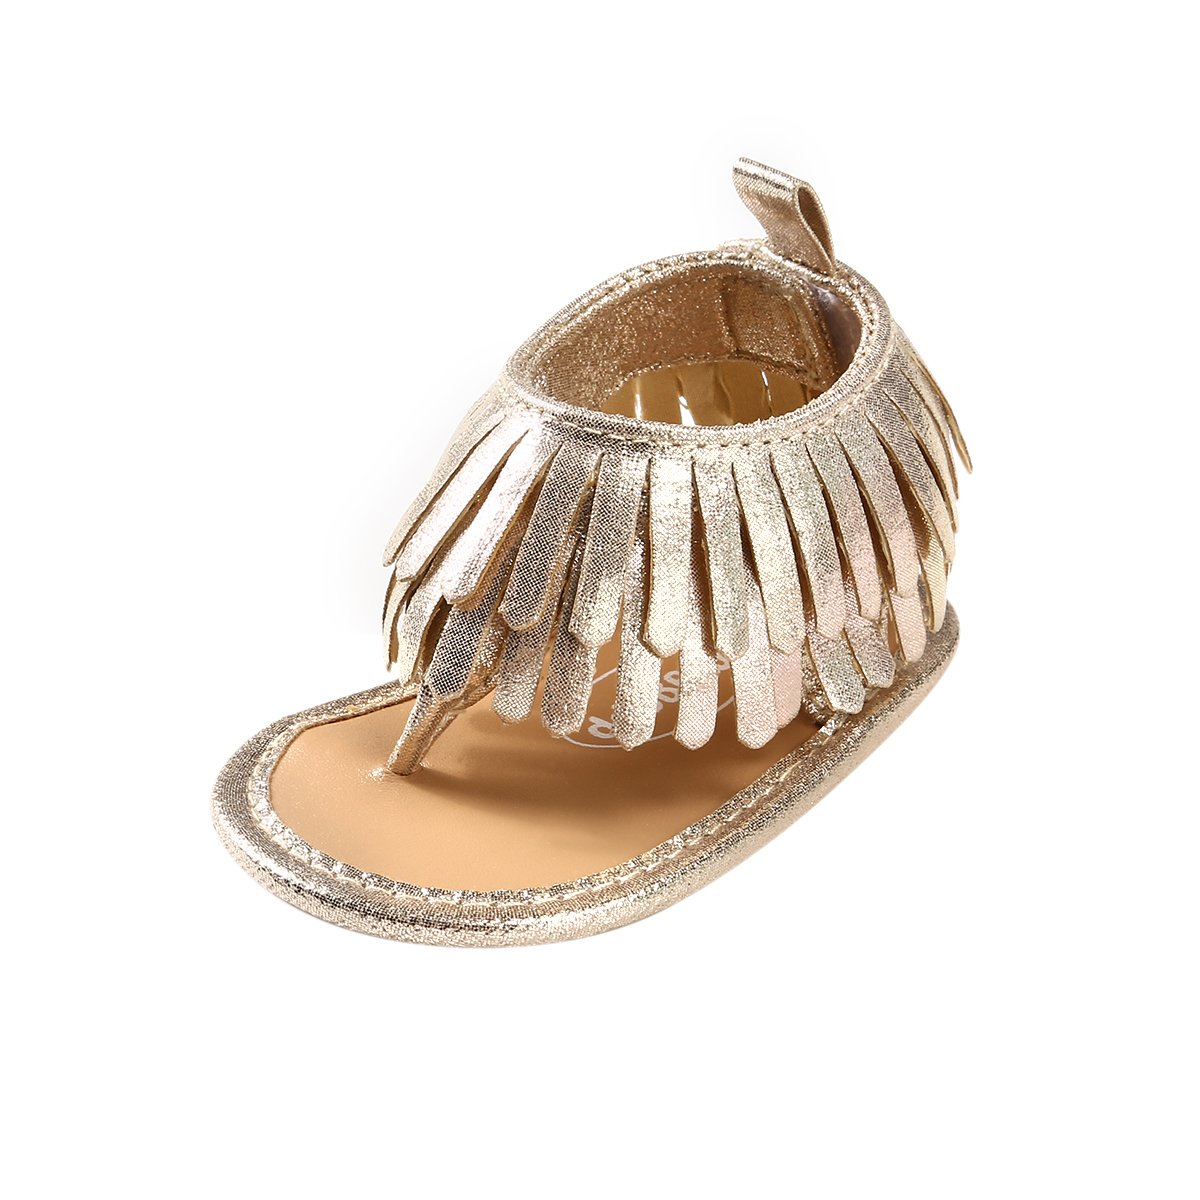 BENHERO Infant Baby Girls Summer Shoes Bling Tassel Soft Sole Prewalker Flip-Flops Sandals